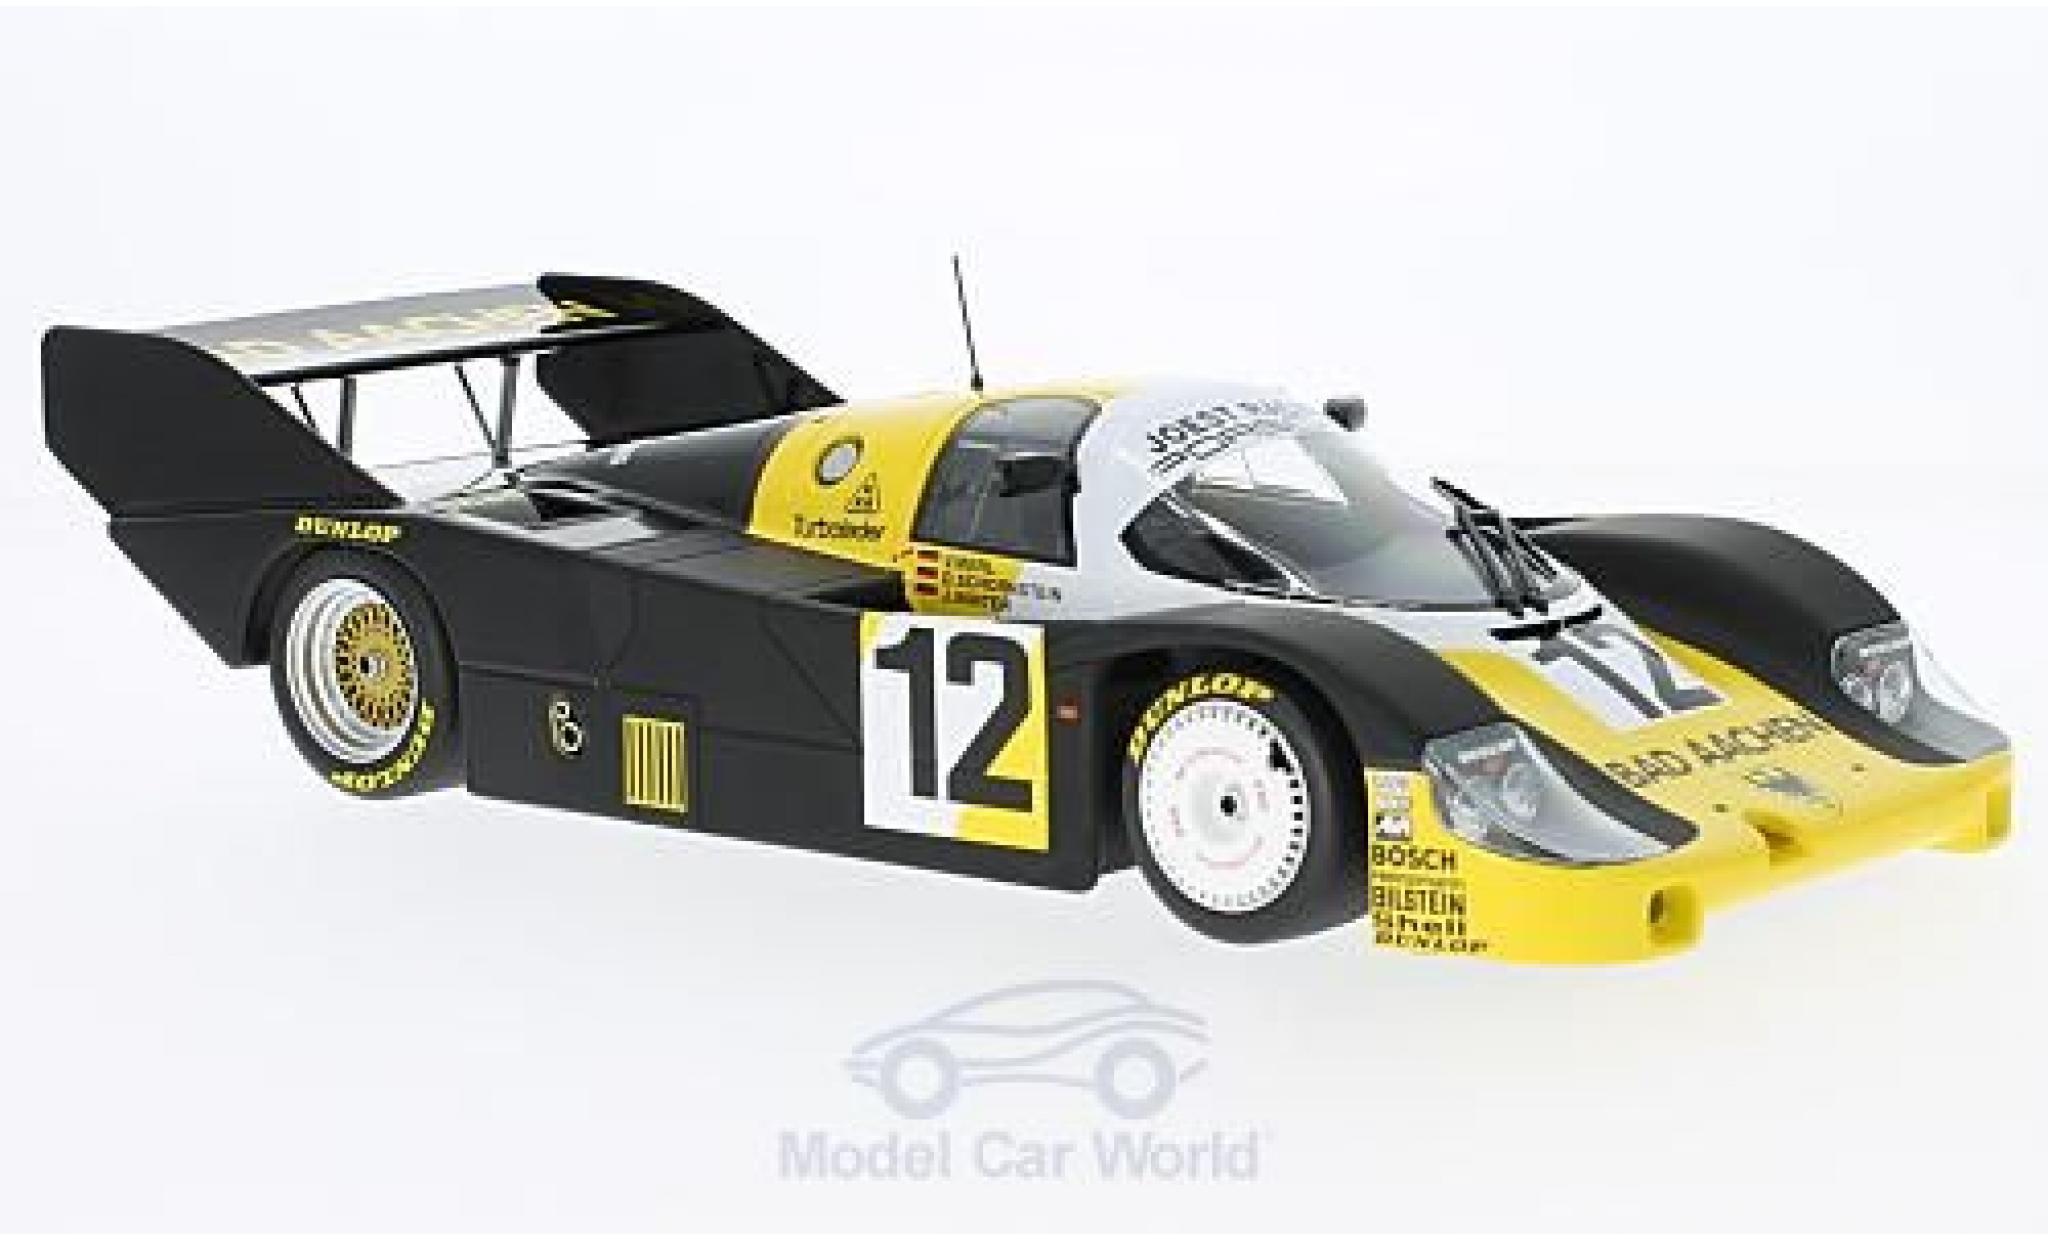 Porsche 956 1984 1/18 Minichamps K No.12 Schornstein Racing Team Bad Aachen 1000km Monza 1984 V.Merl/D.Schornstein